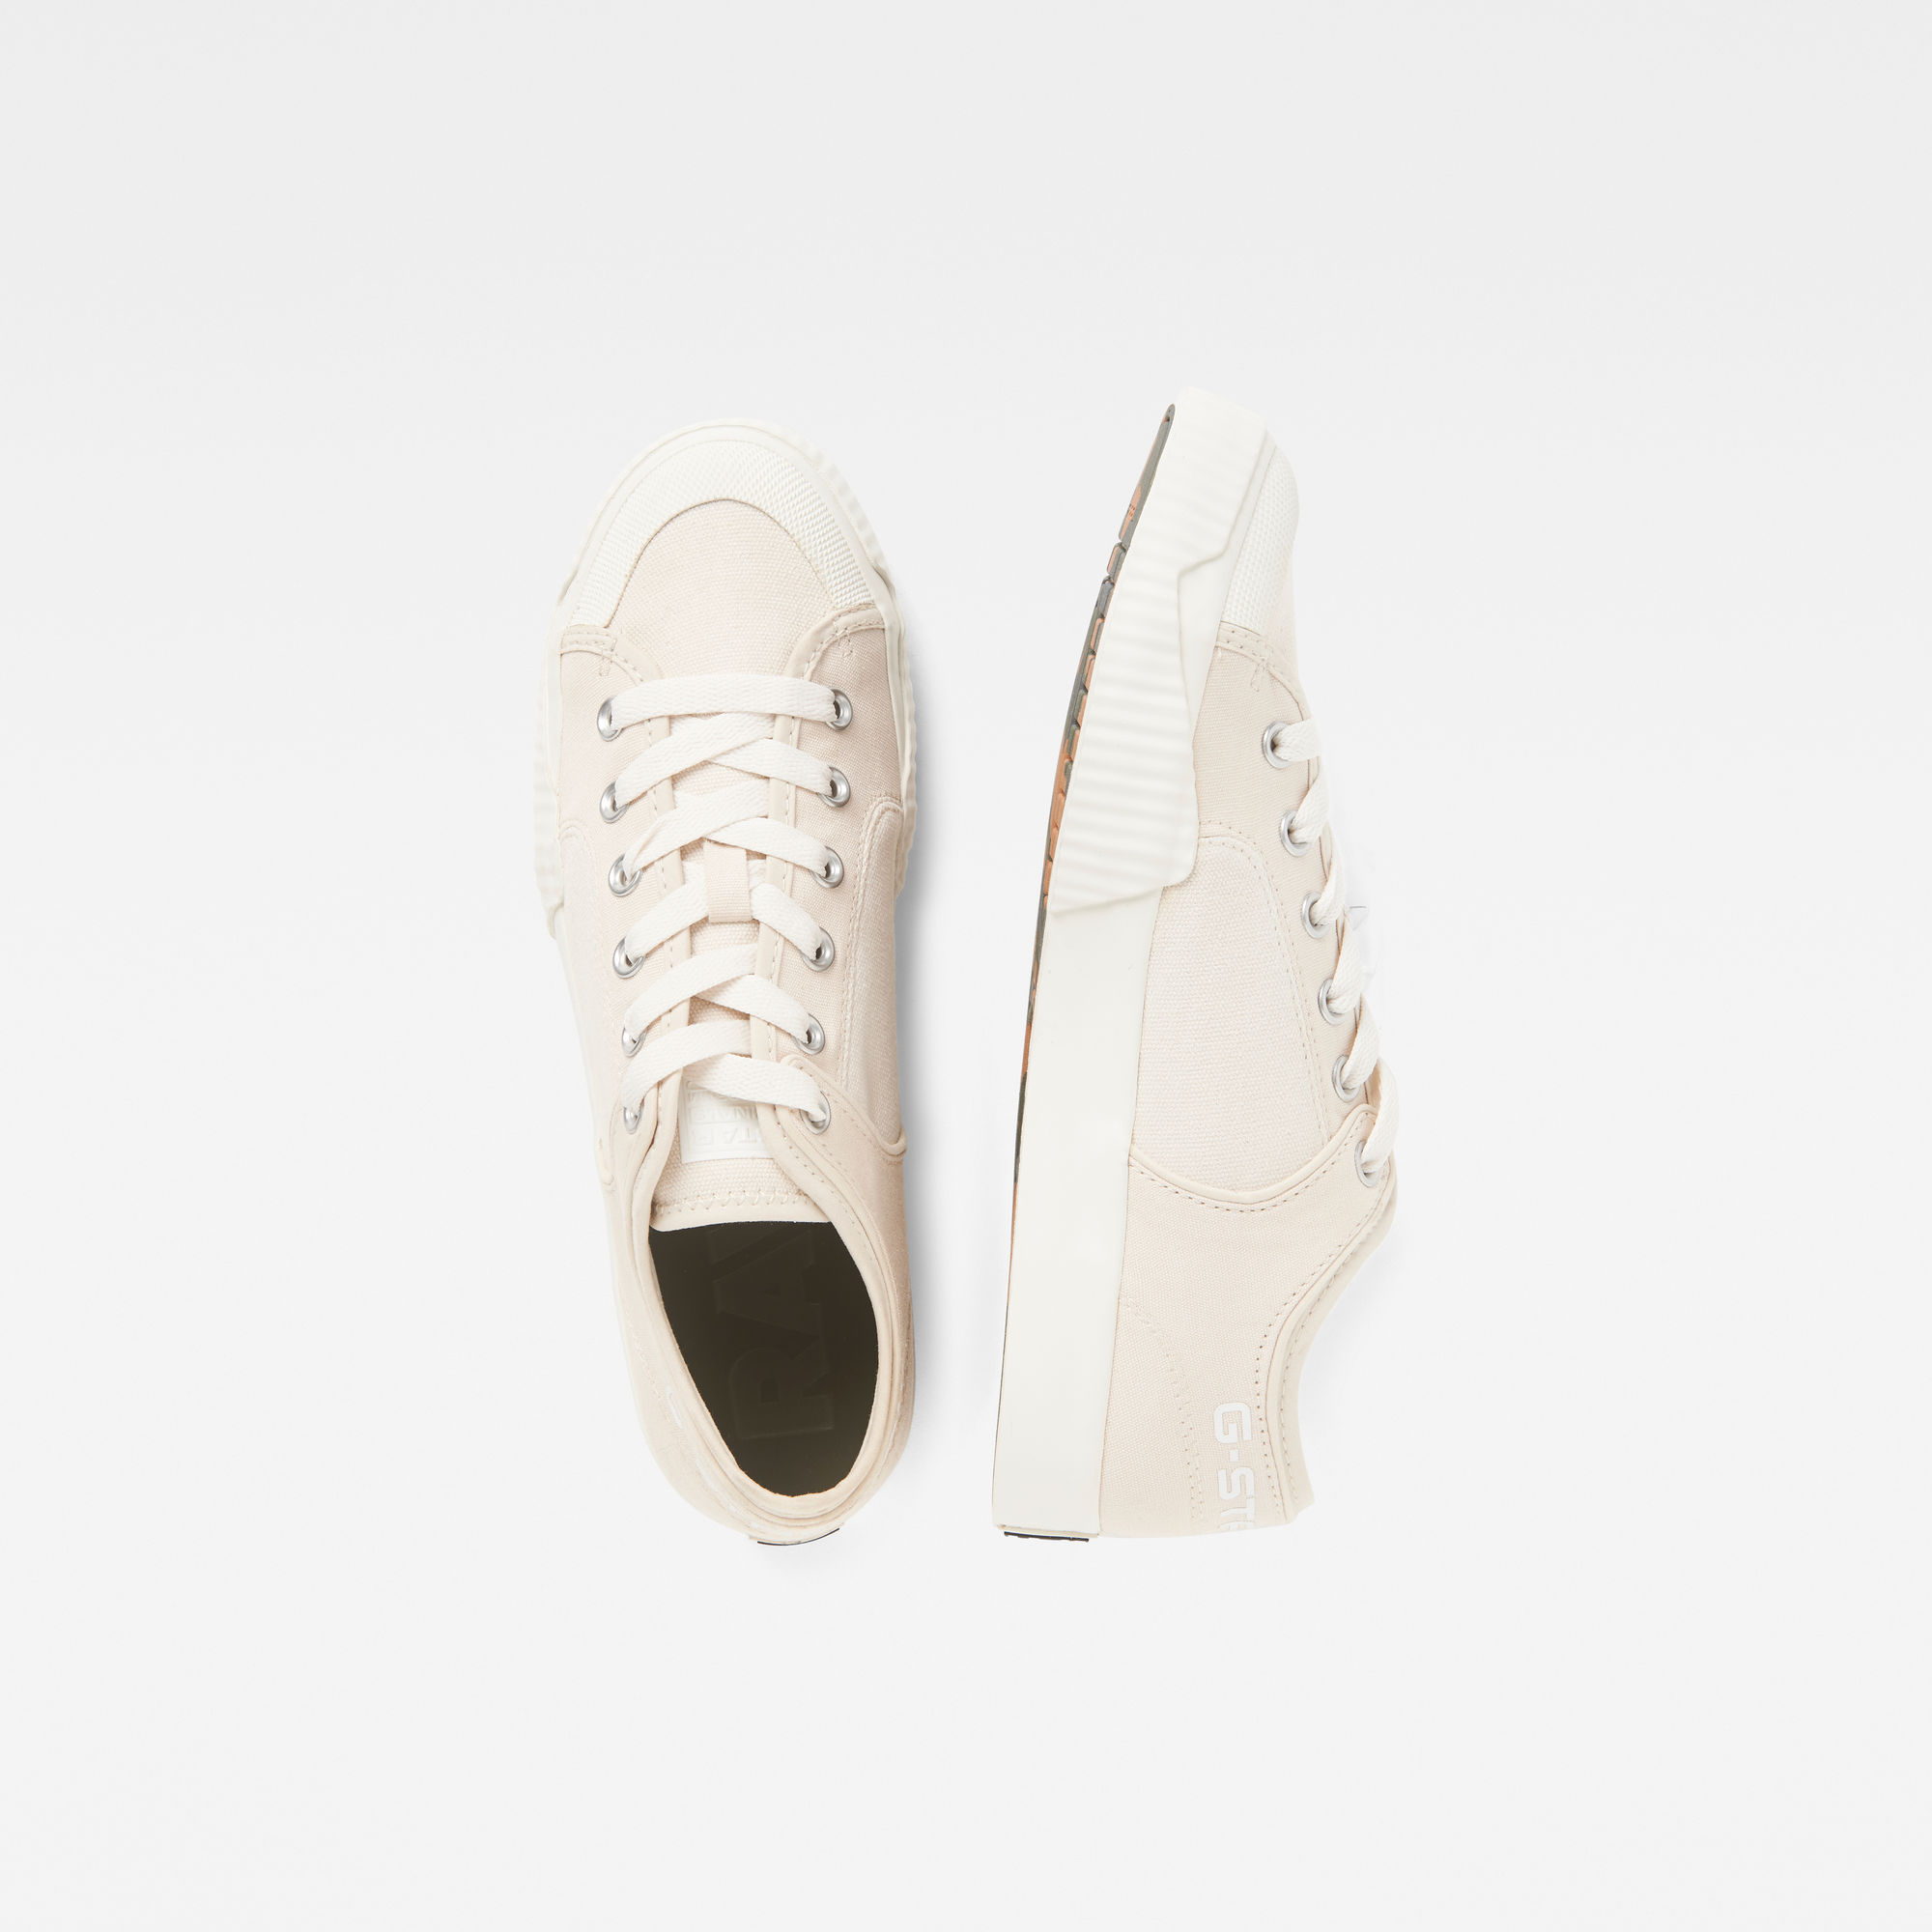 G-Star RAW Rackam Tendric Low Sneakers